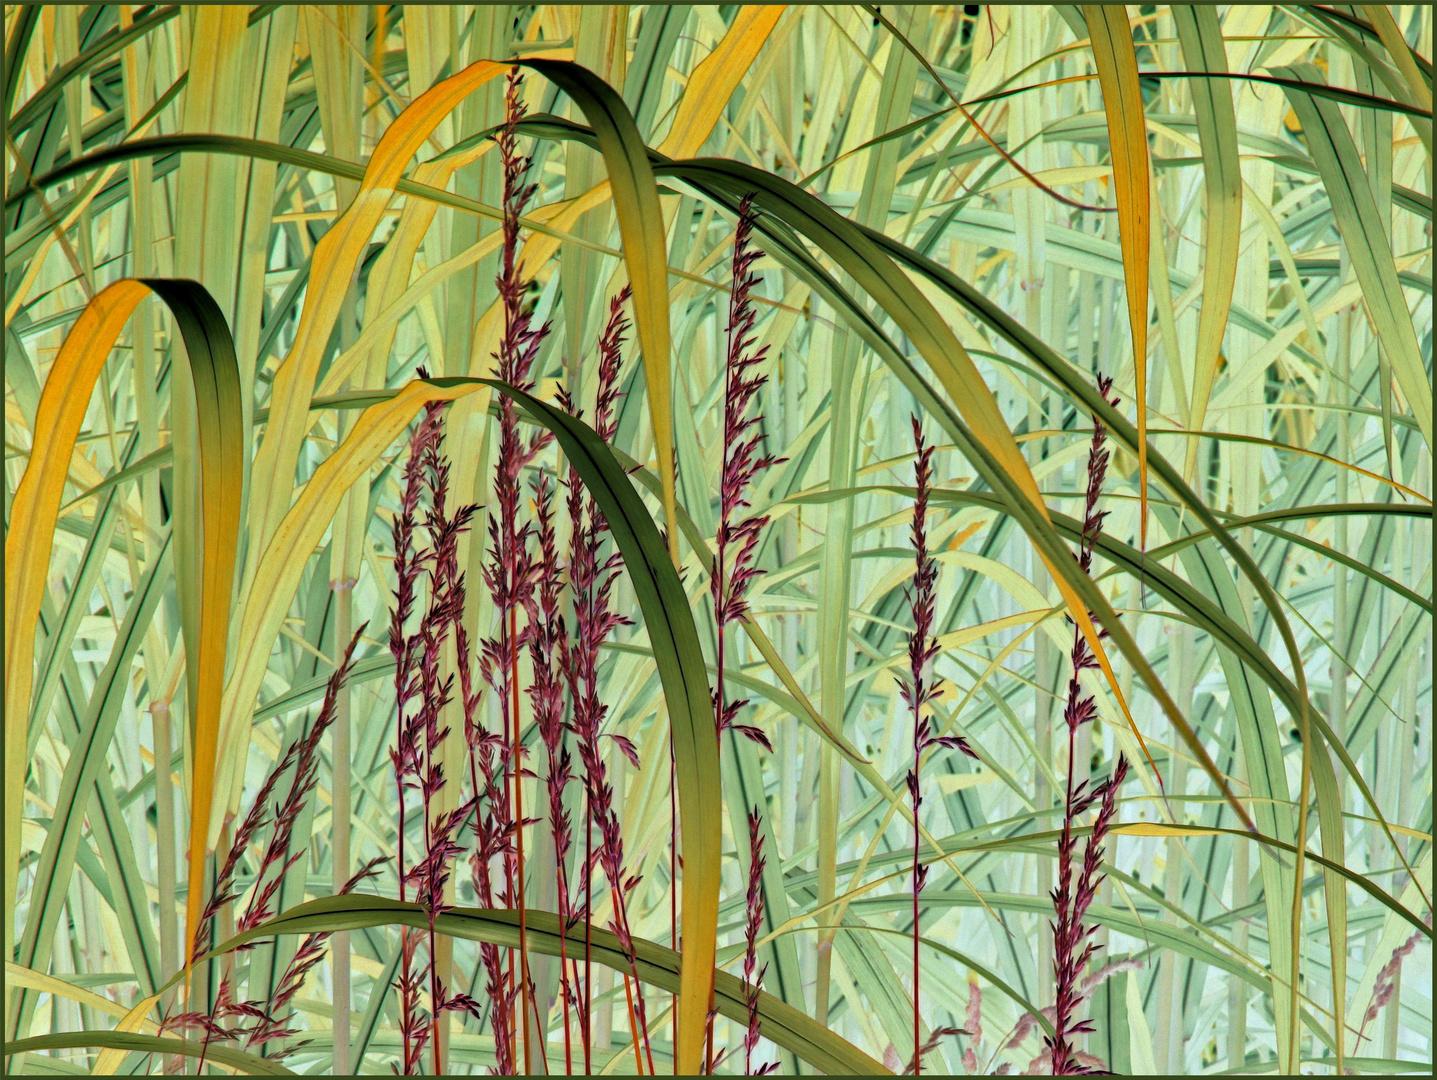 Phantastic Grass Yellow